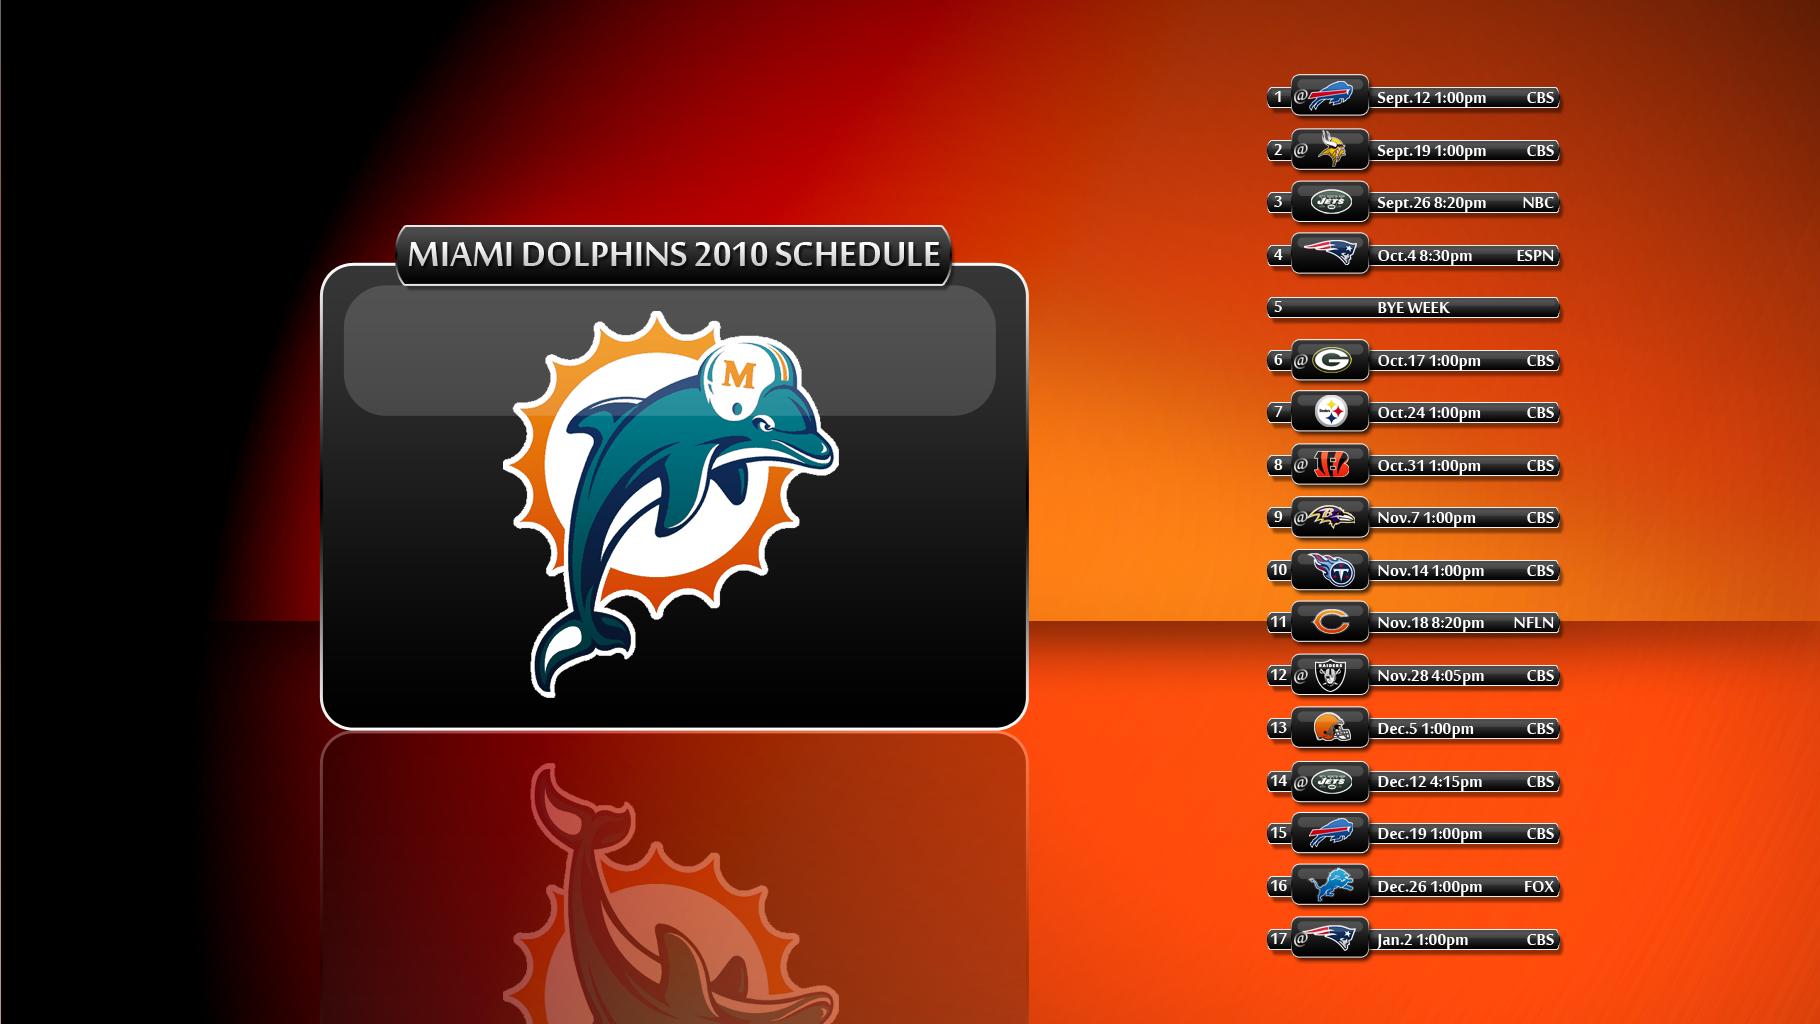 Miami Dolphins 2016 Schedule Wallpaper WallpaperSafari